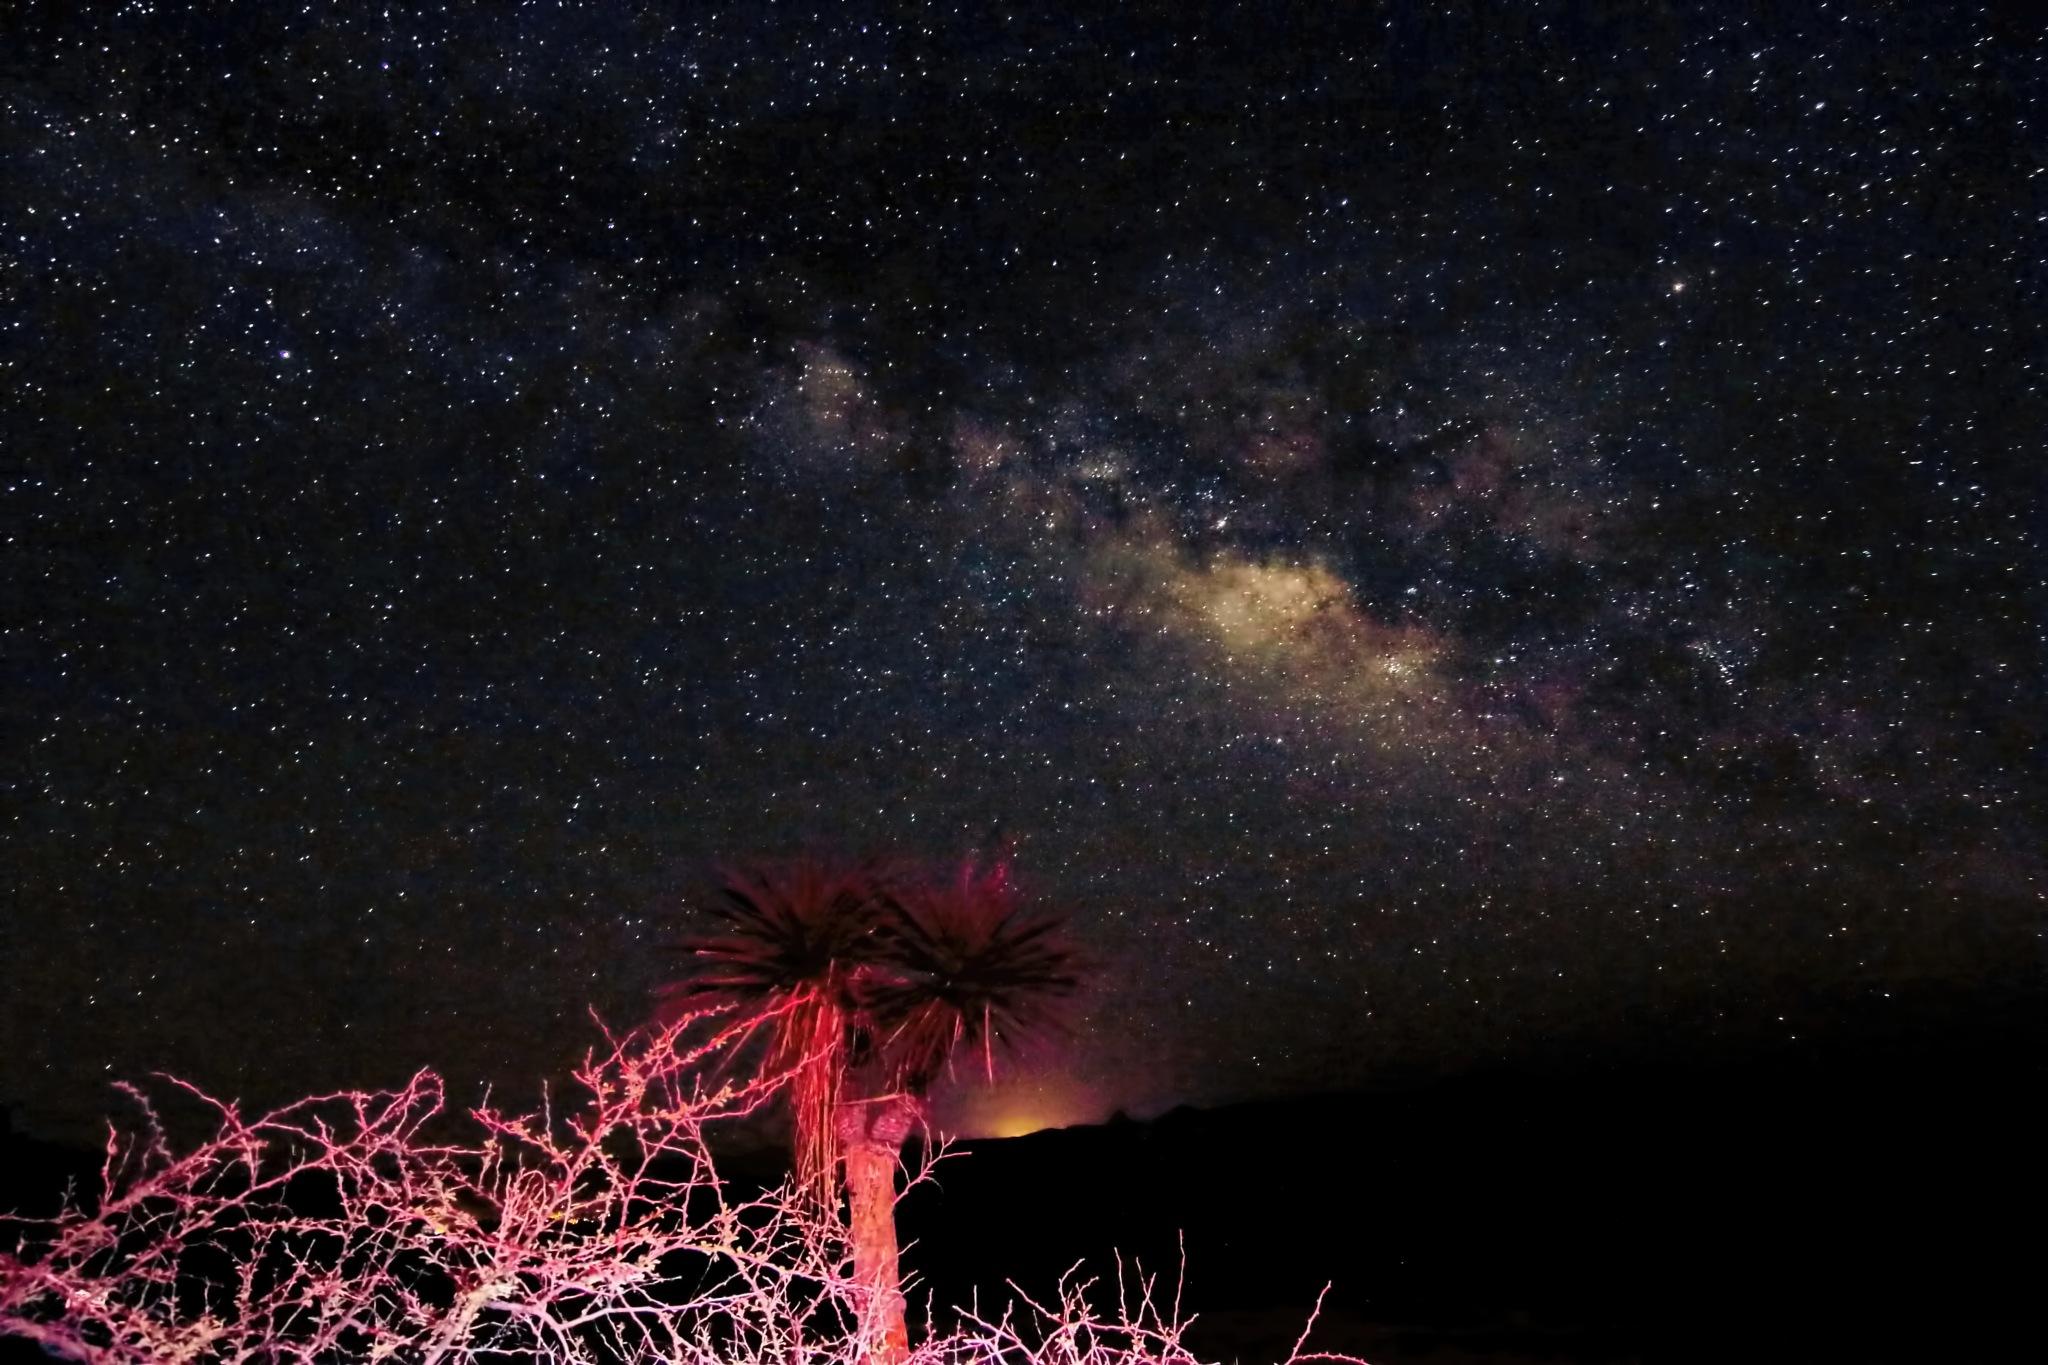 Milky Way & Light Painting by daniel.luna.77920